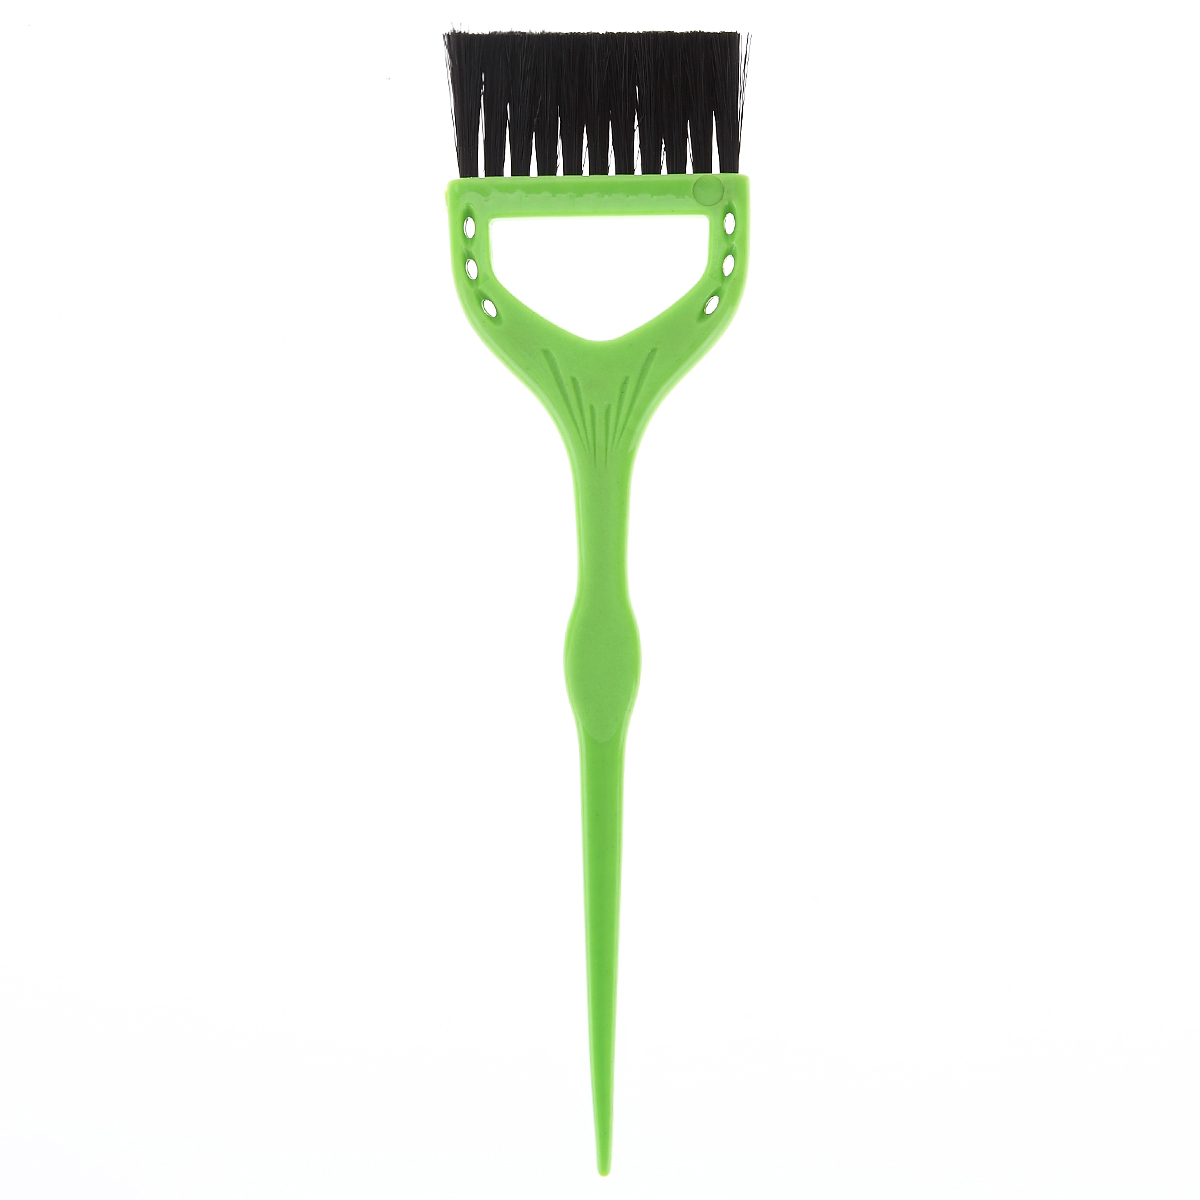 Plastic Hair Style Dye Brush Bleach Tint Perm Application